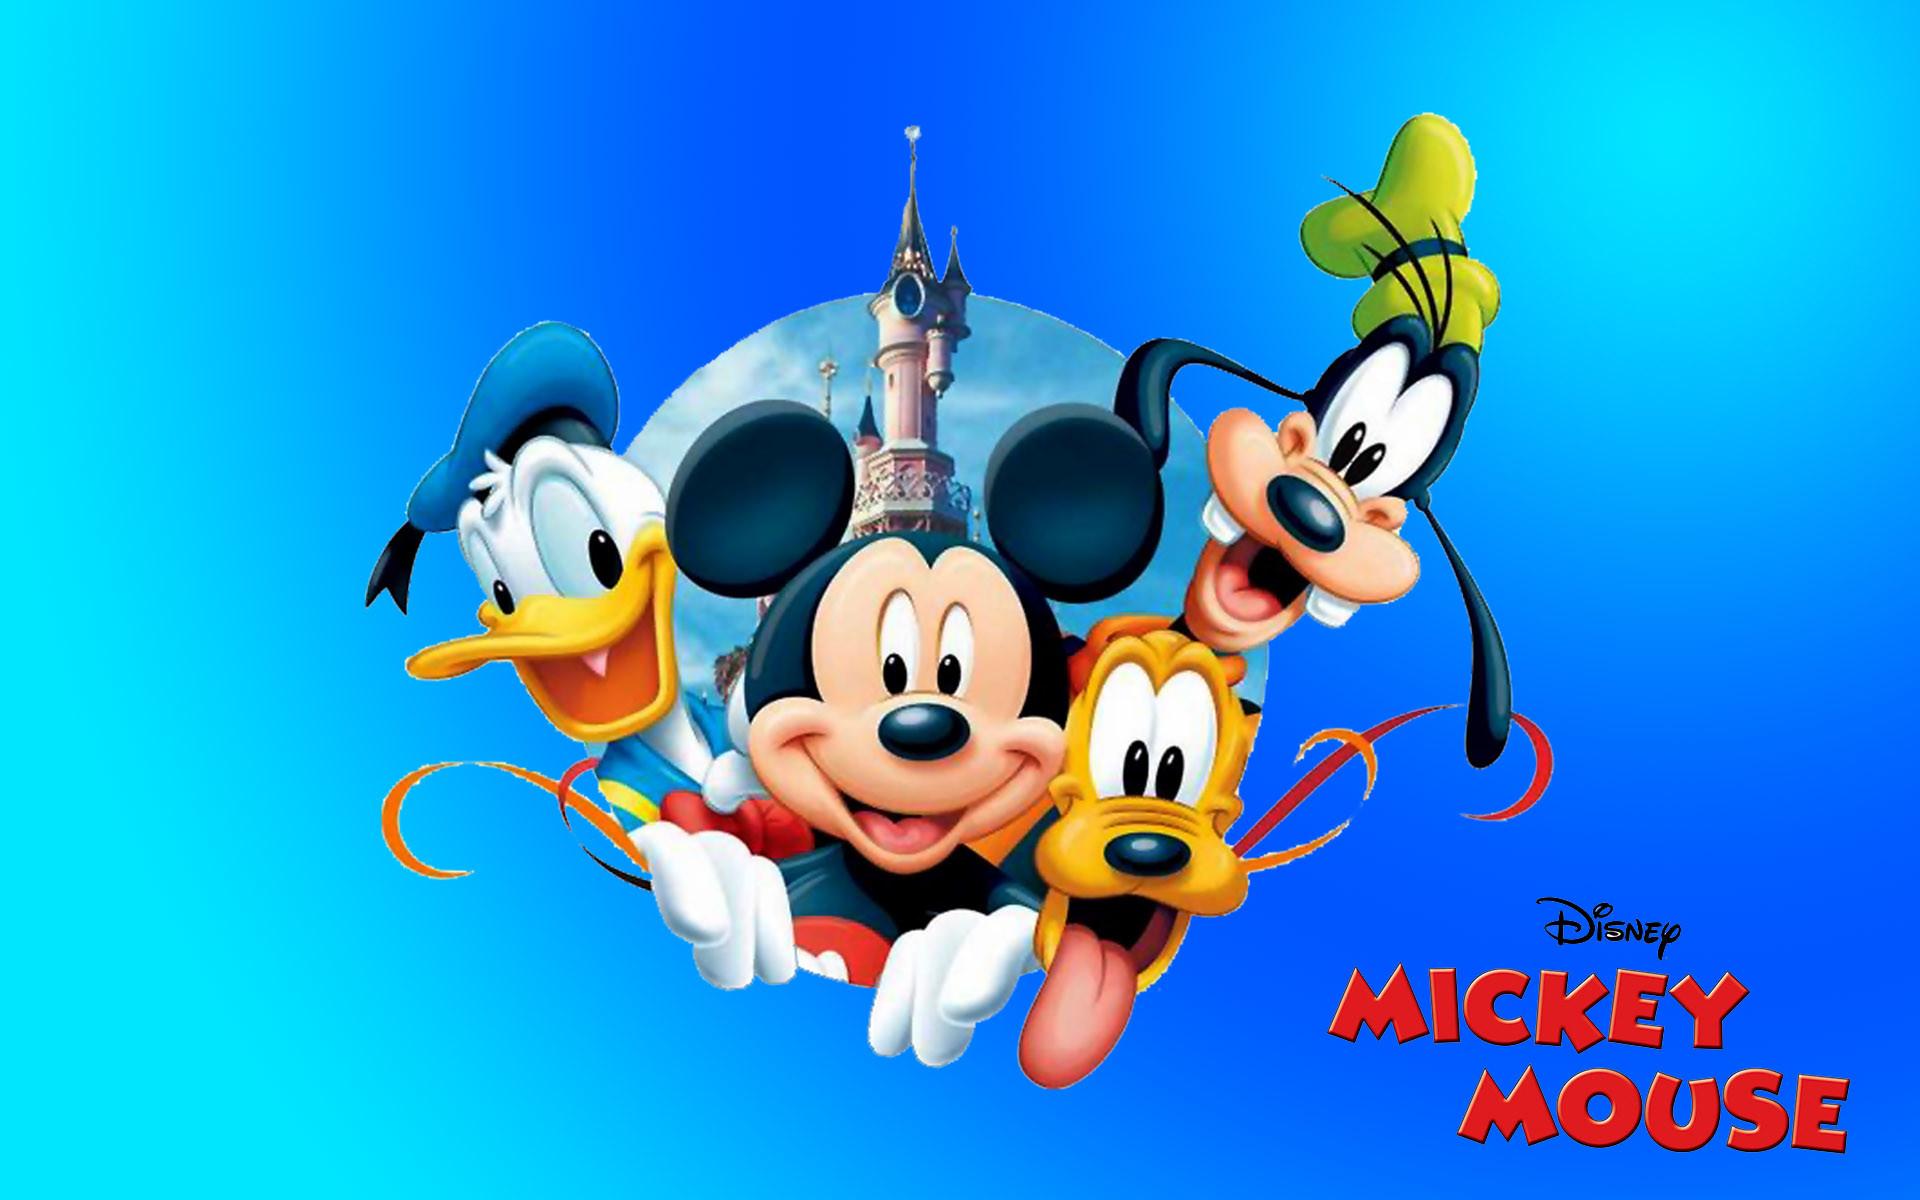 Wonderful Wallpaper Halloween Mickey Mouse - 1174205-mickey-mouse-wallpaper-1920x1200-windows-xp  Photograph_27893.jpg